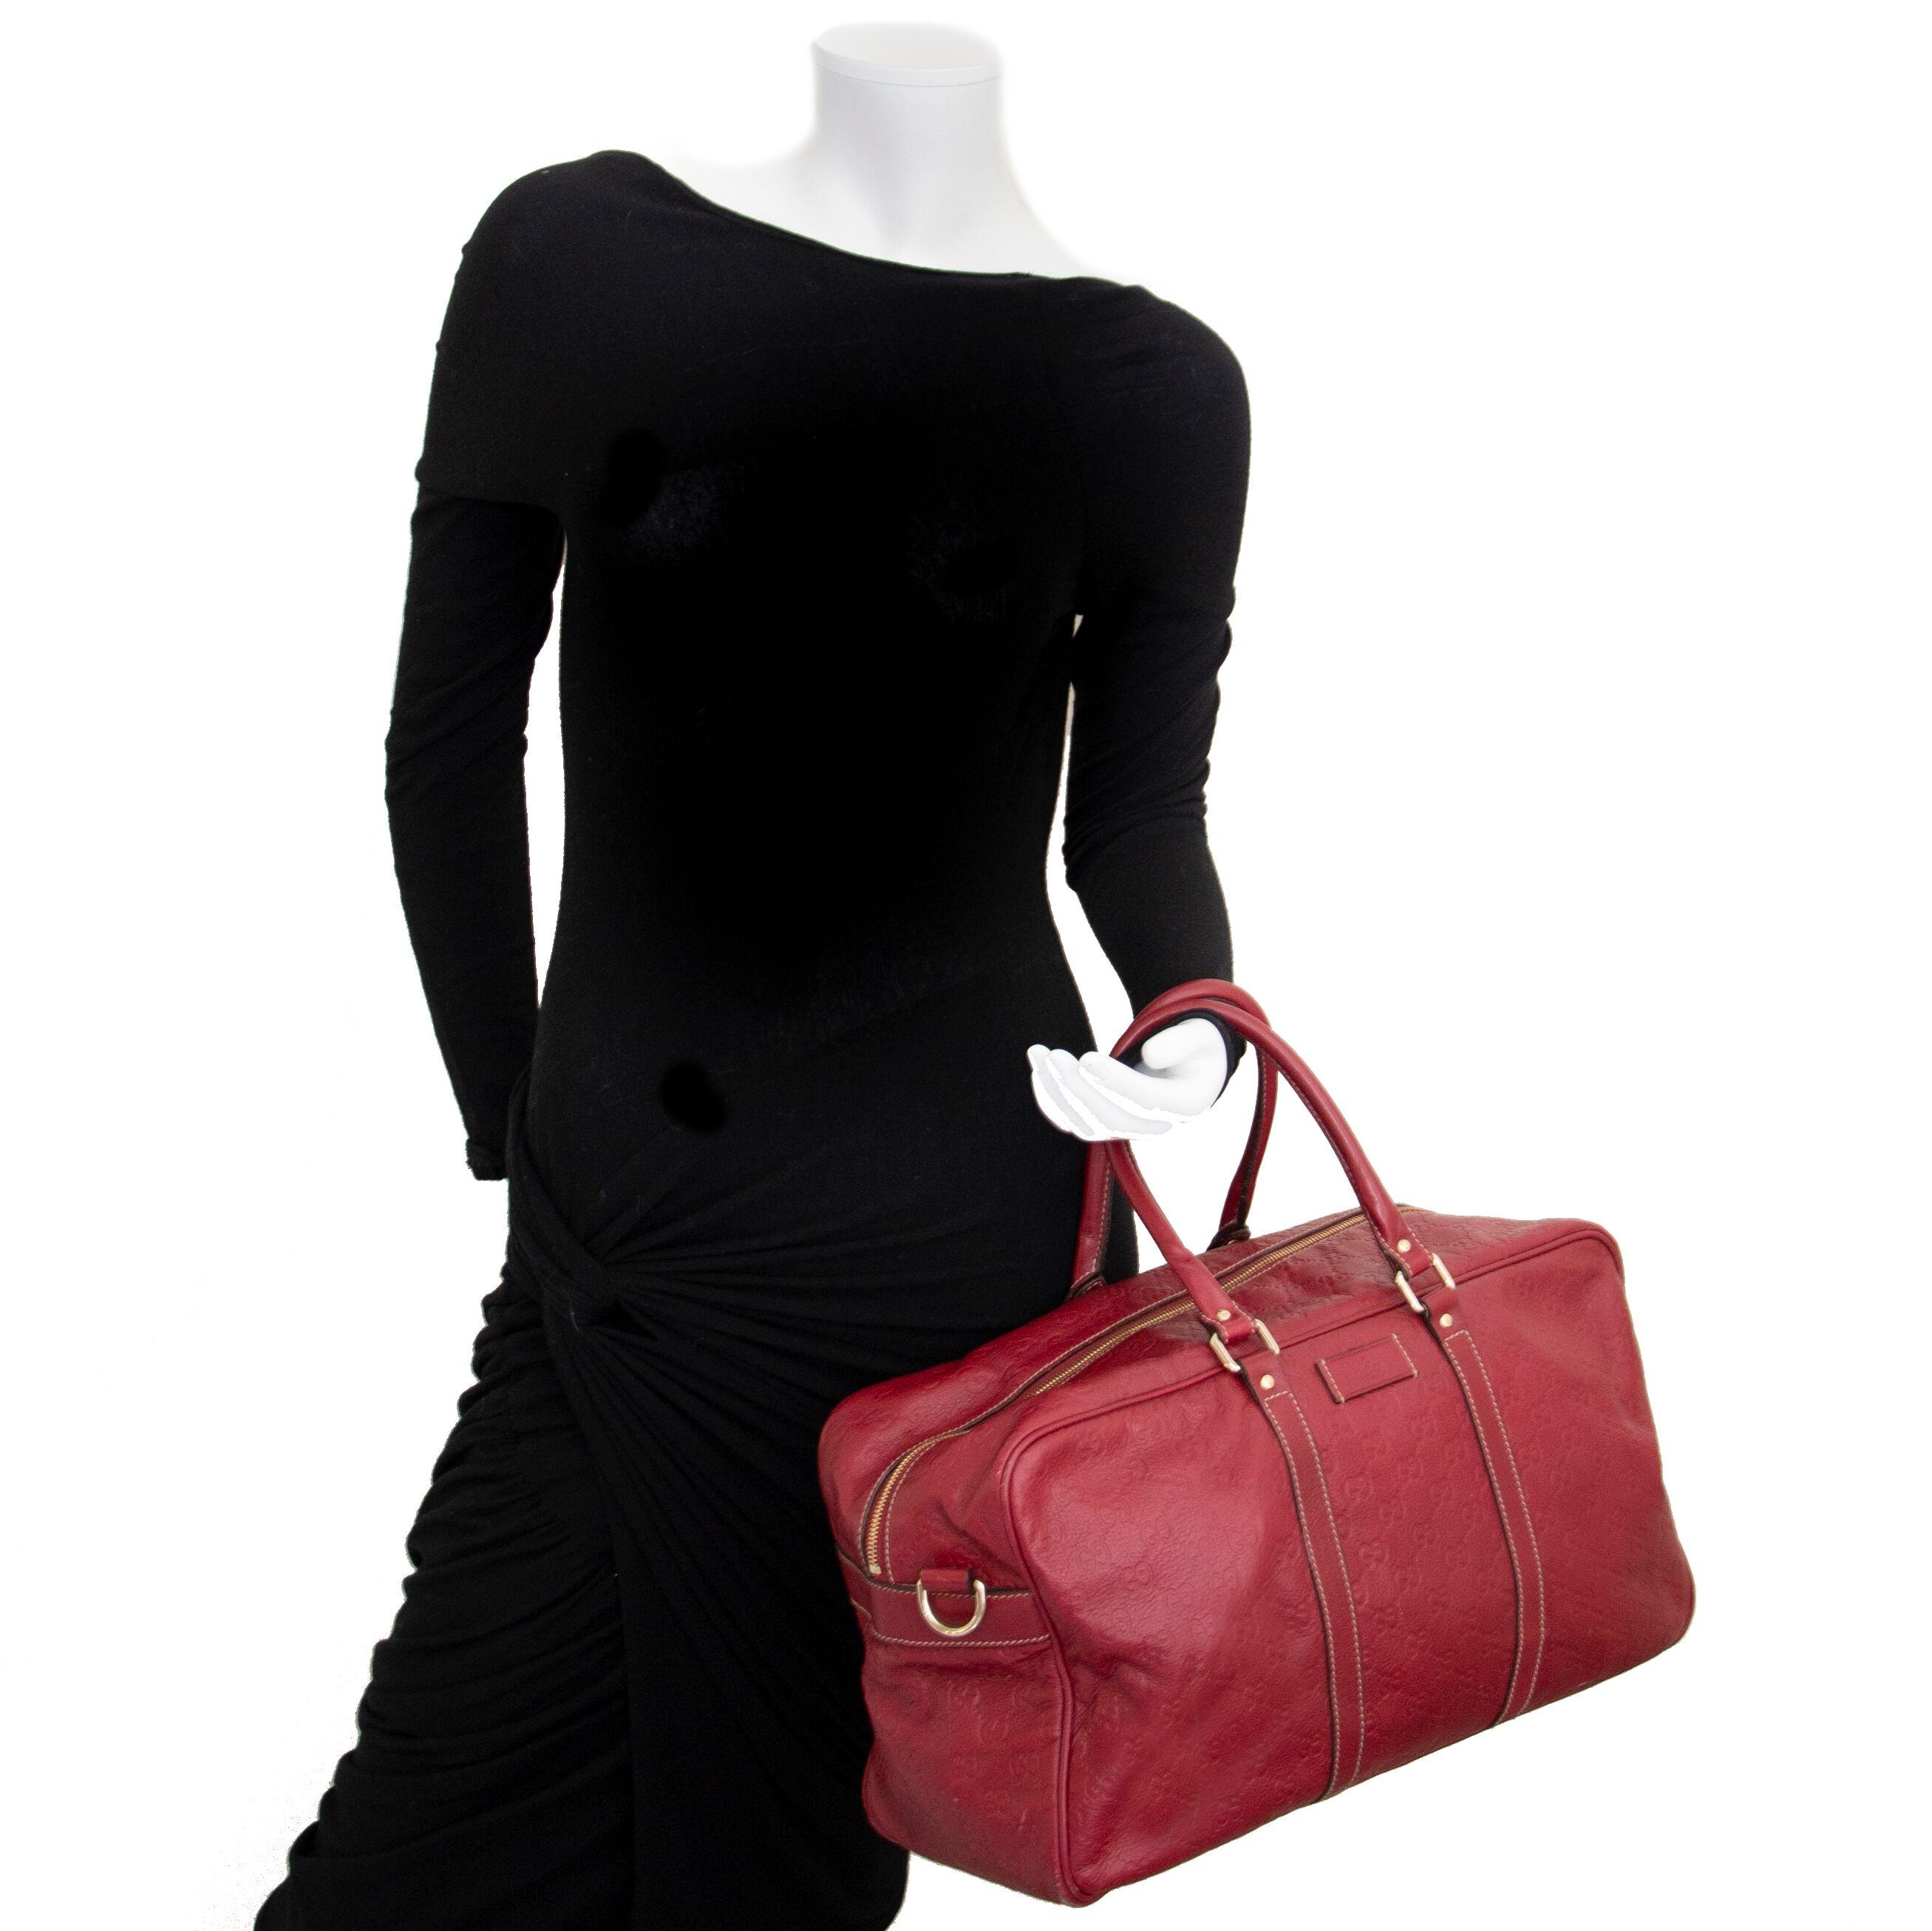 Secondhand Gucci bag.